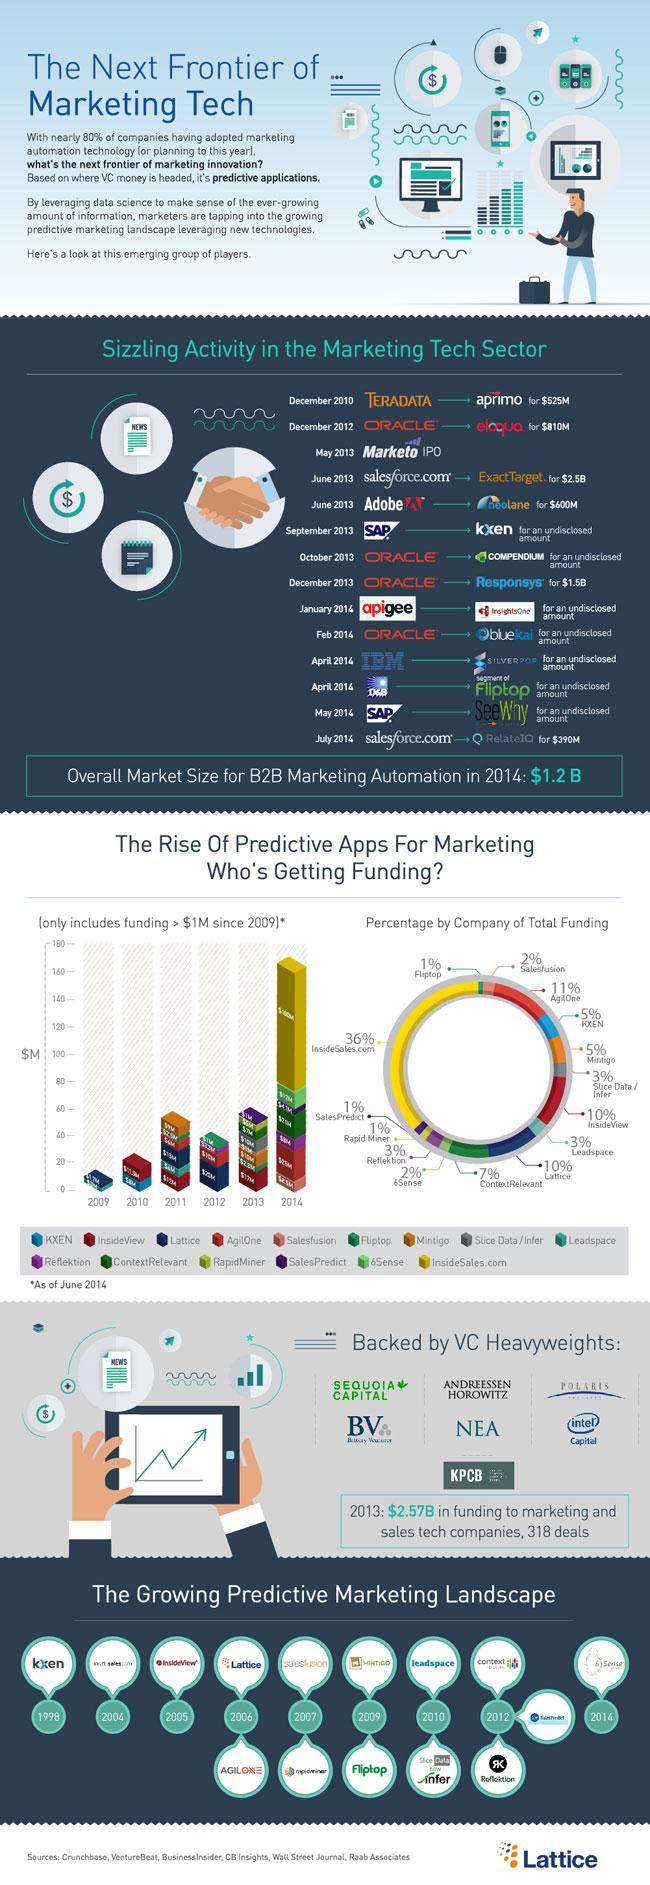 marketing-tech-frontier